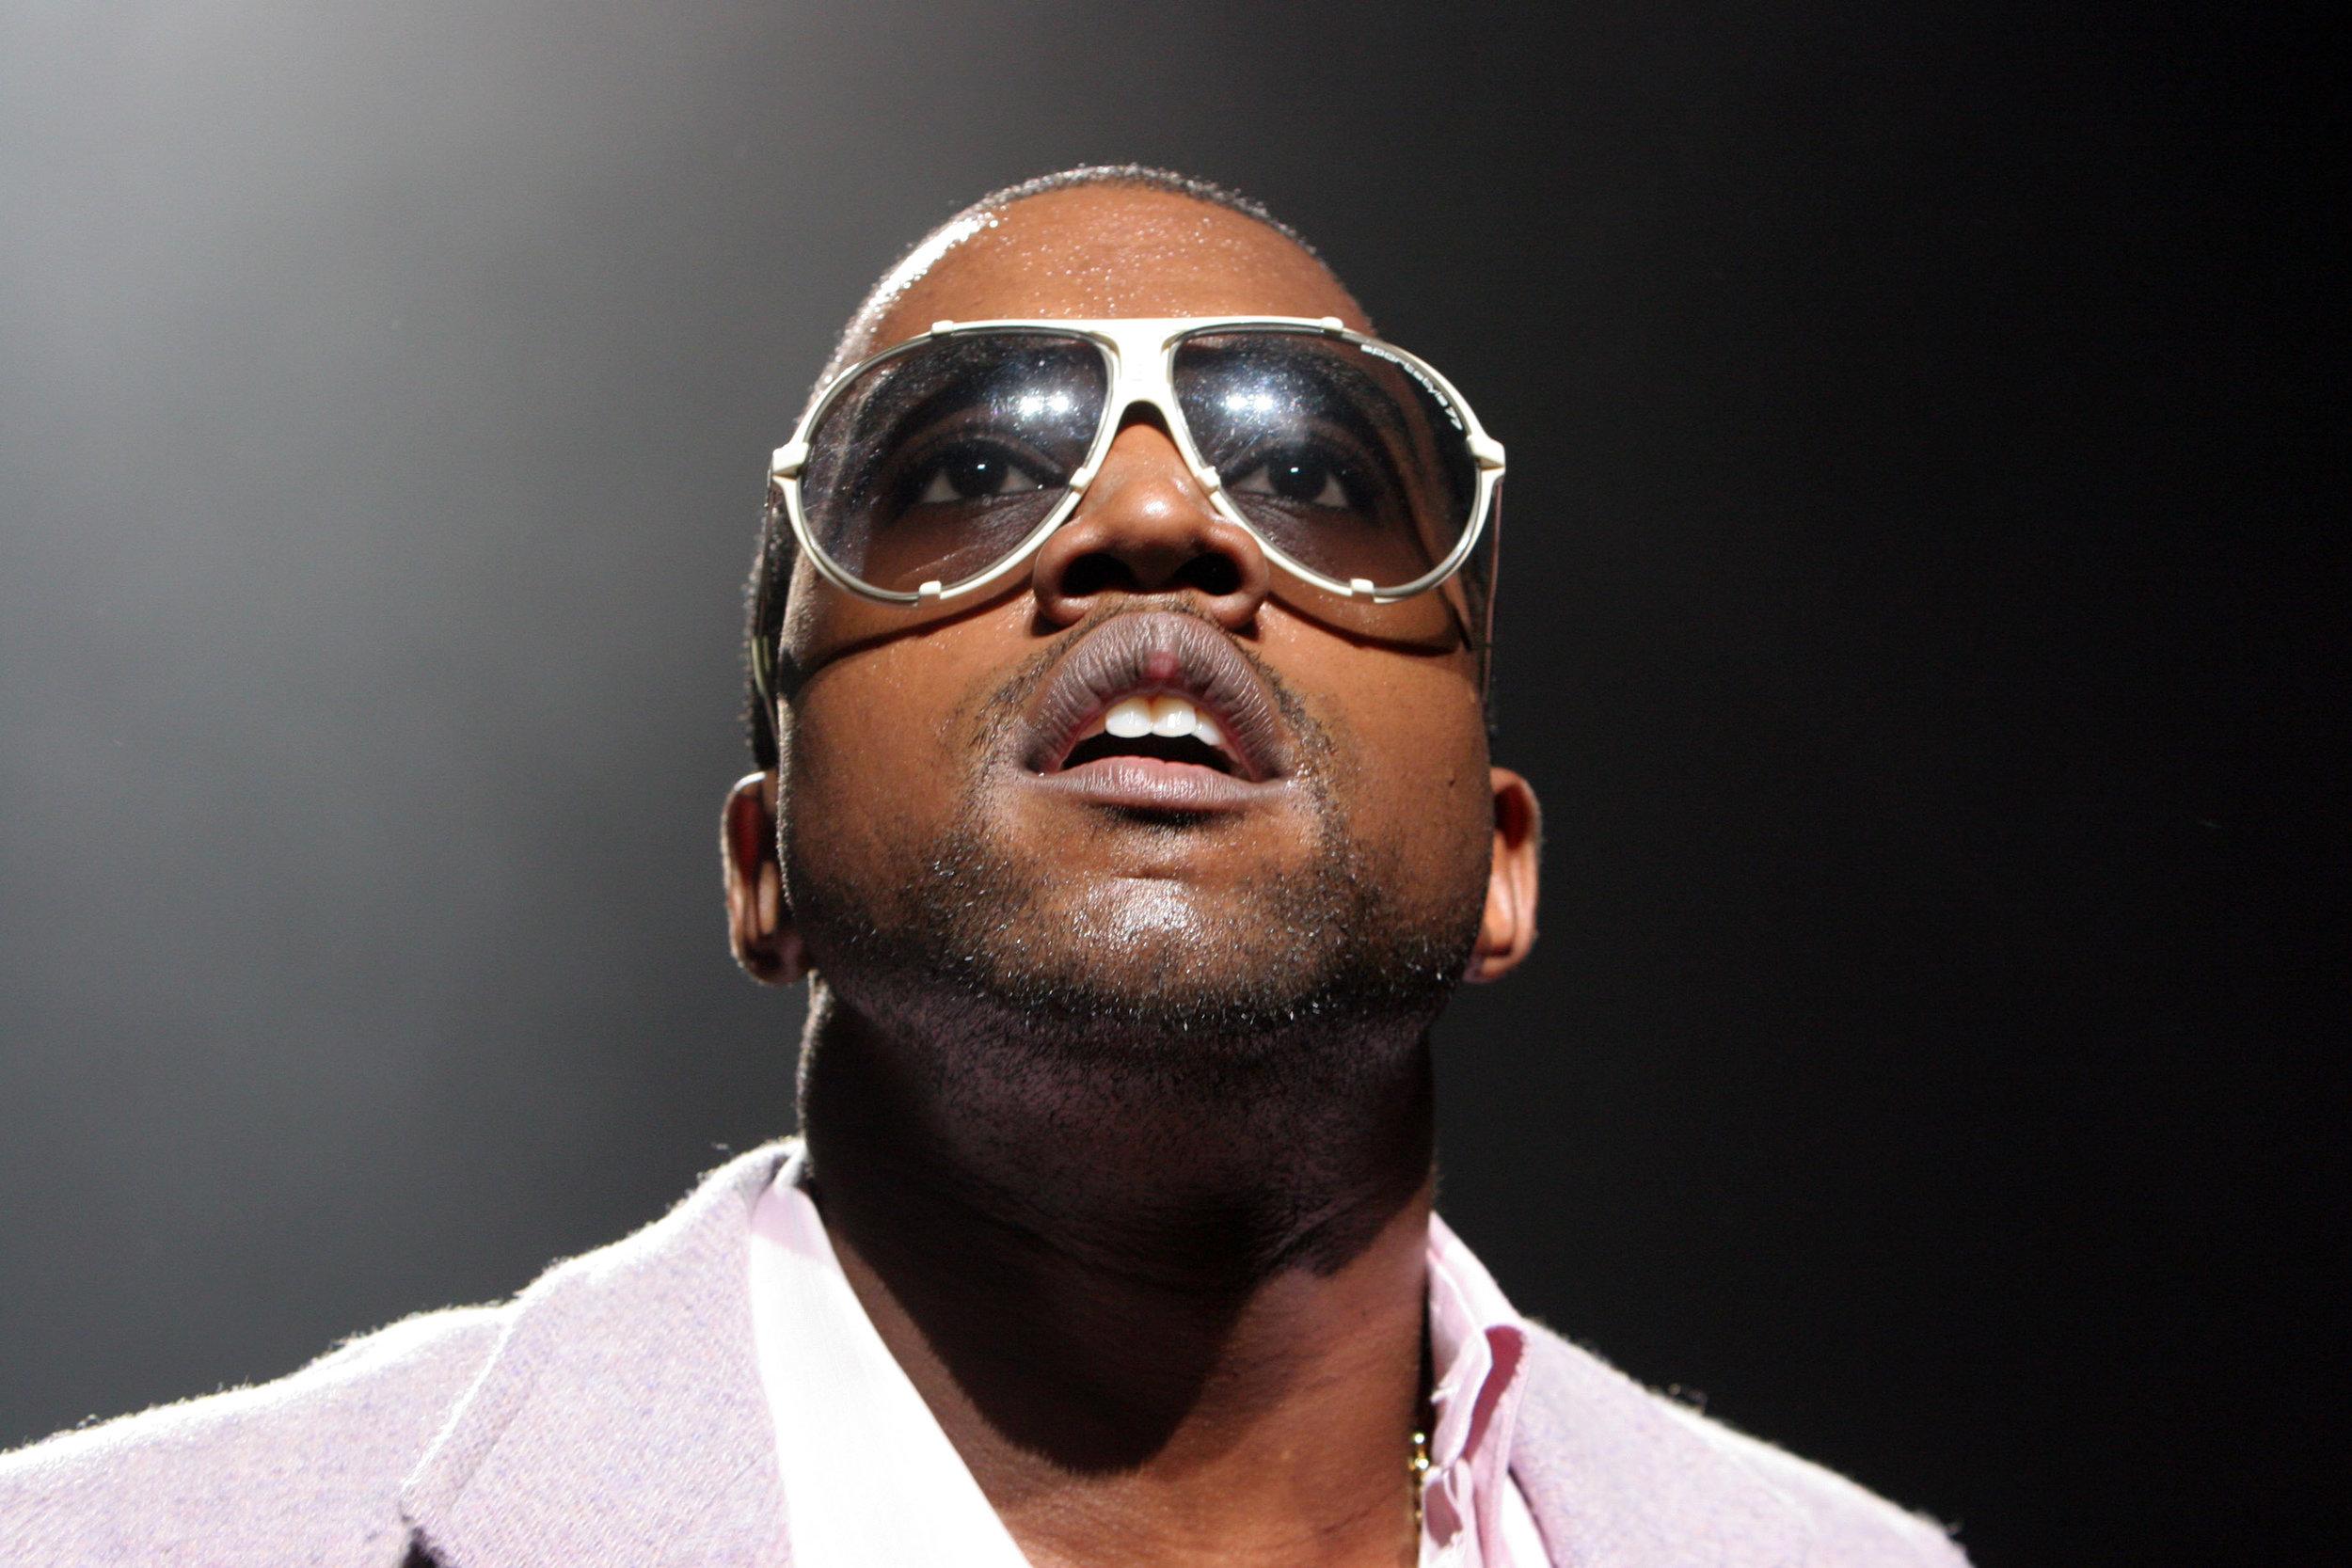 Kanye_102205_mouth_FC.jpg